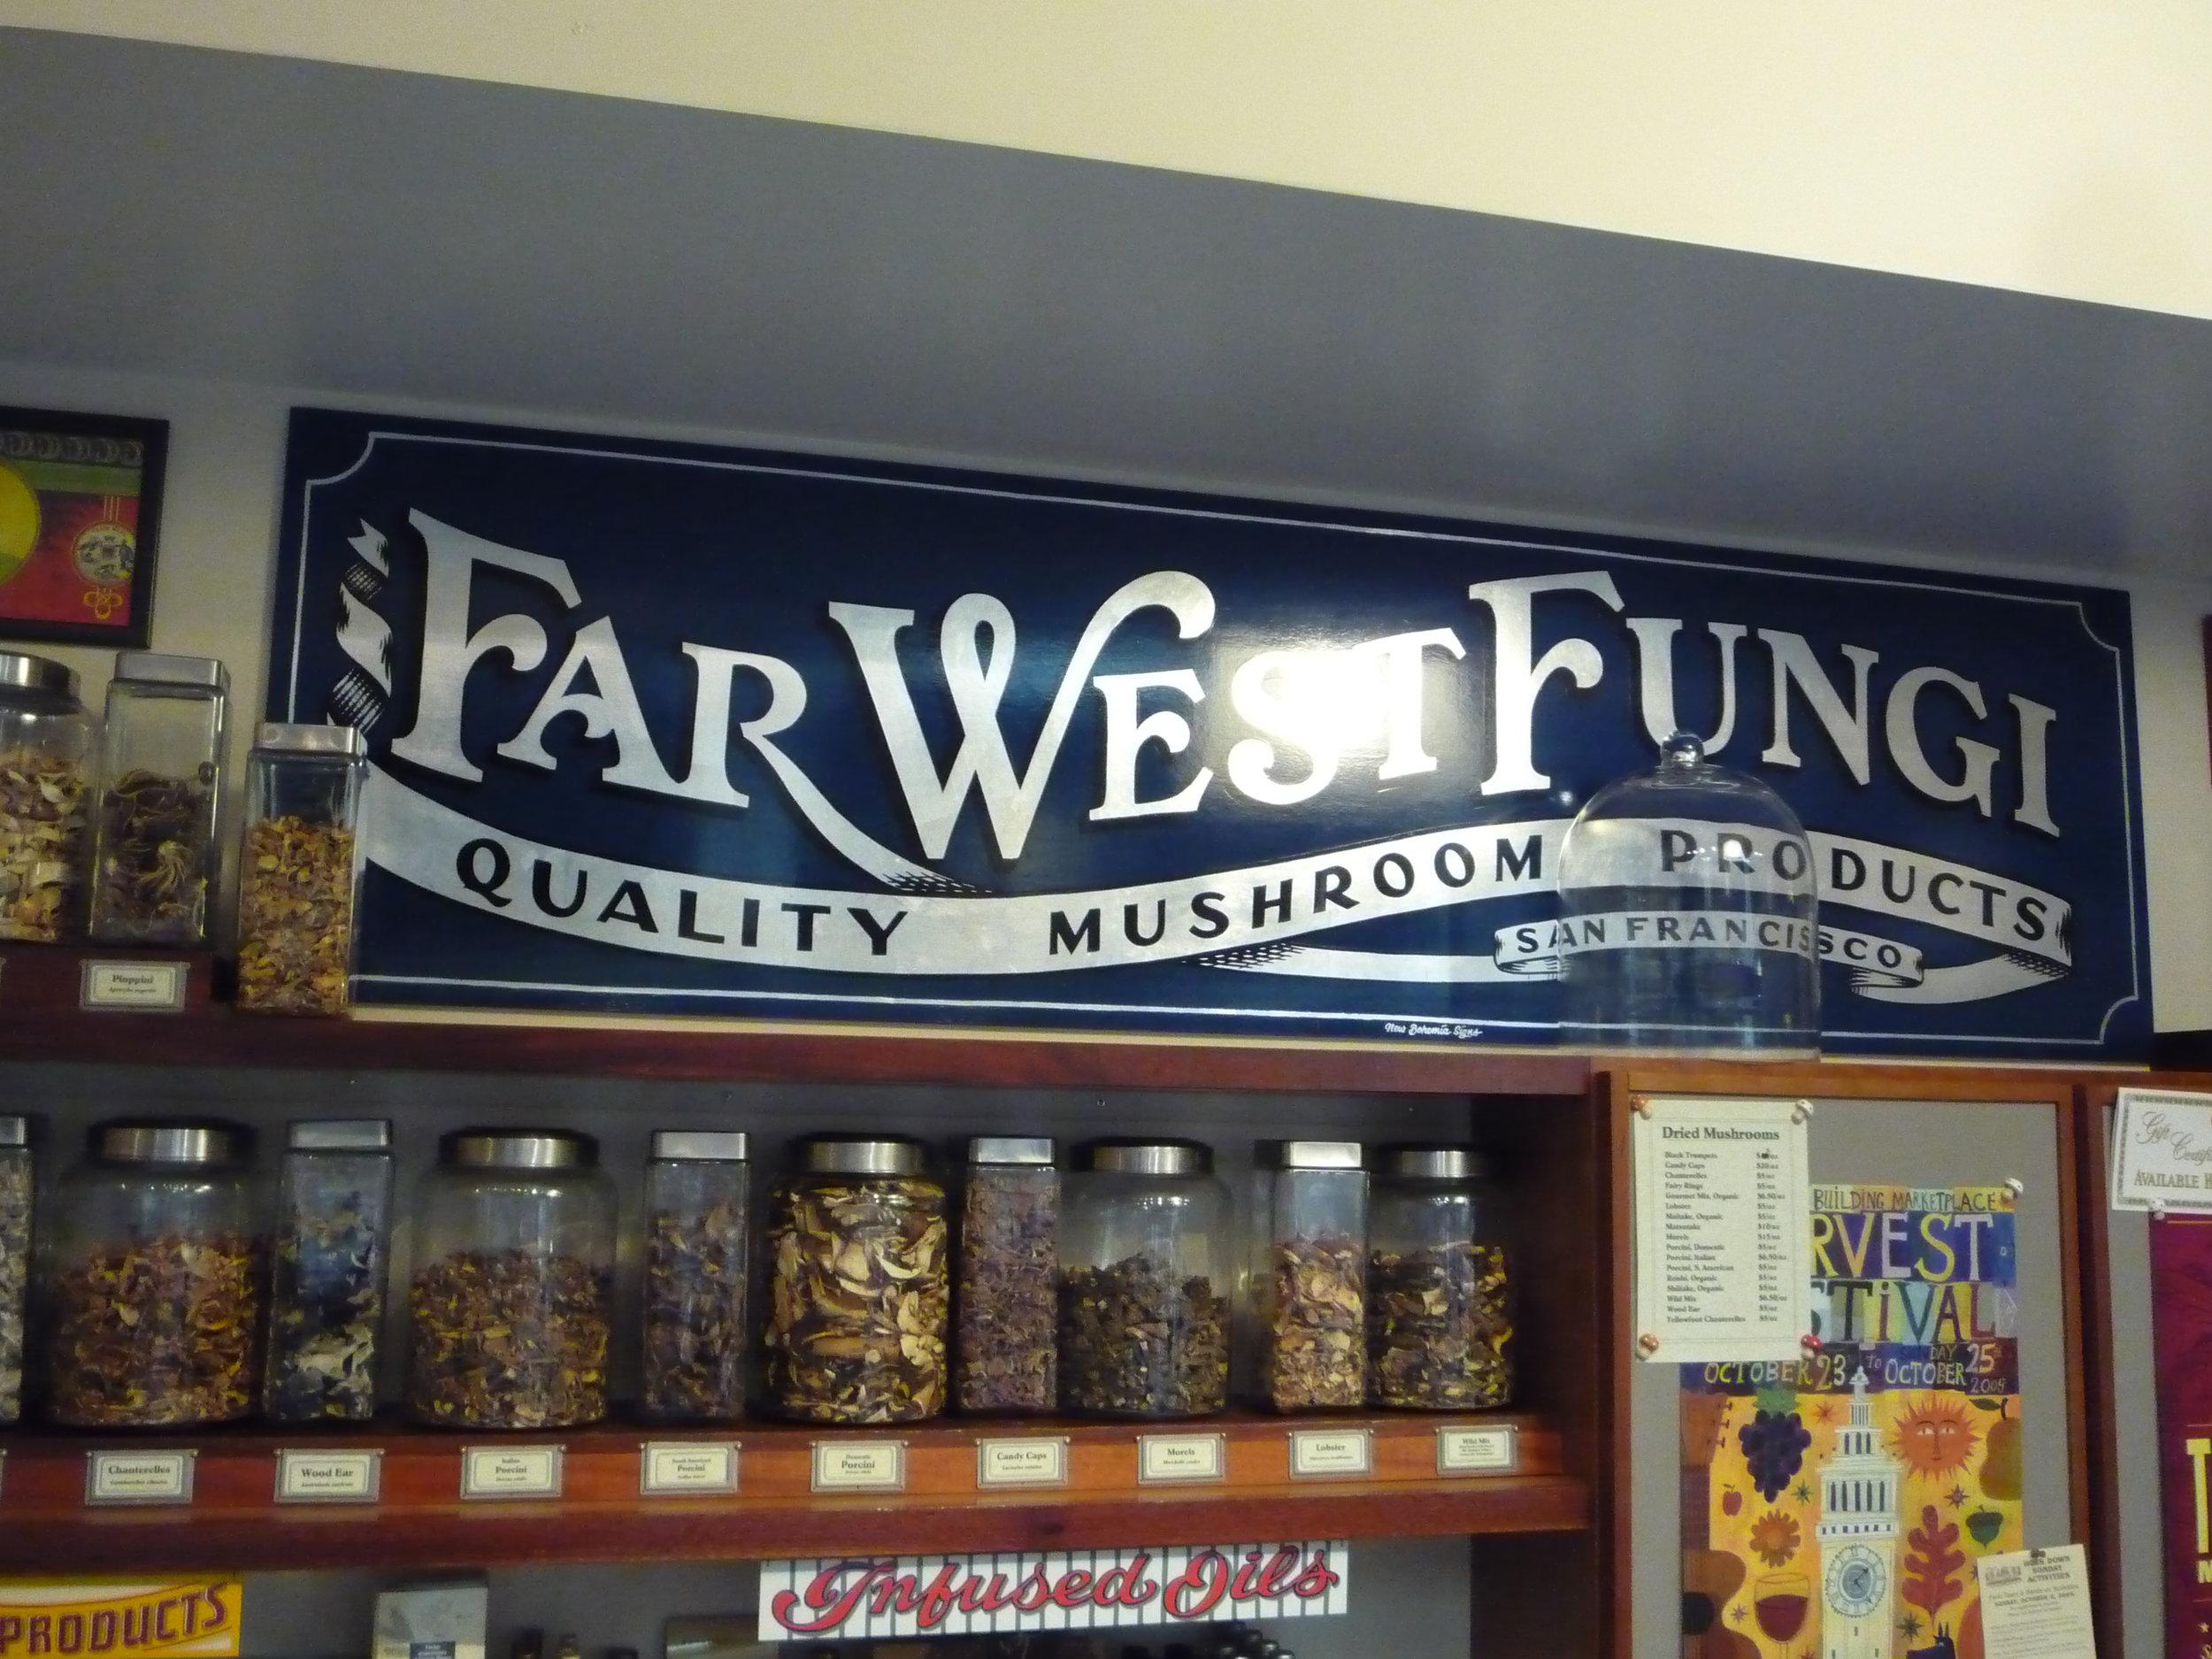 ORIG-far-west-fungi-interior-sign_4322992235_o.jpg